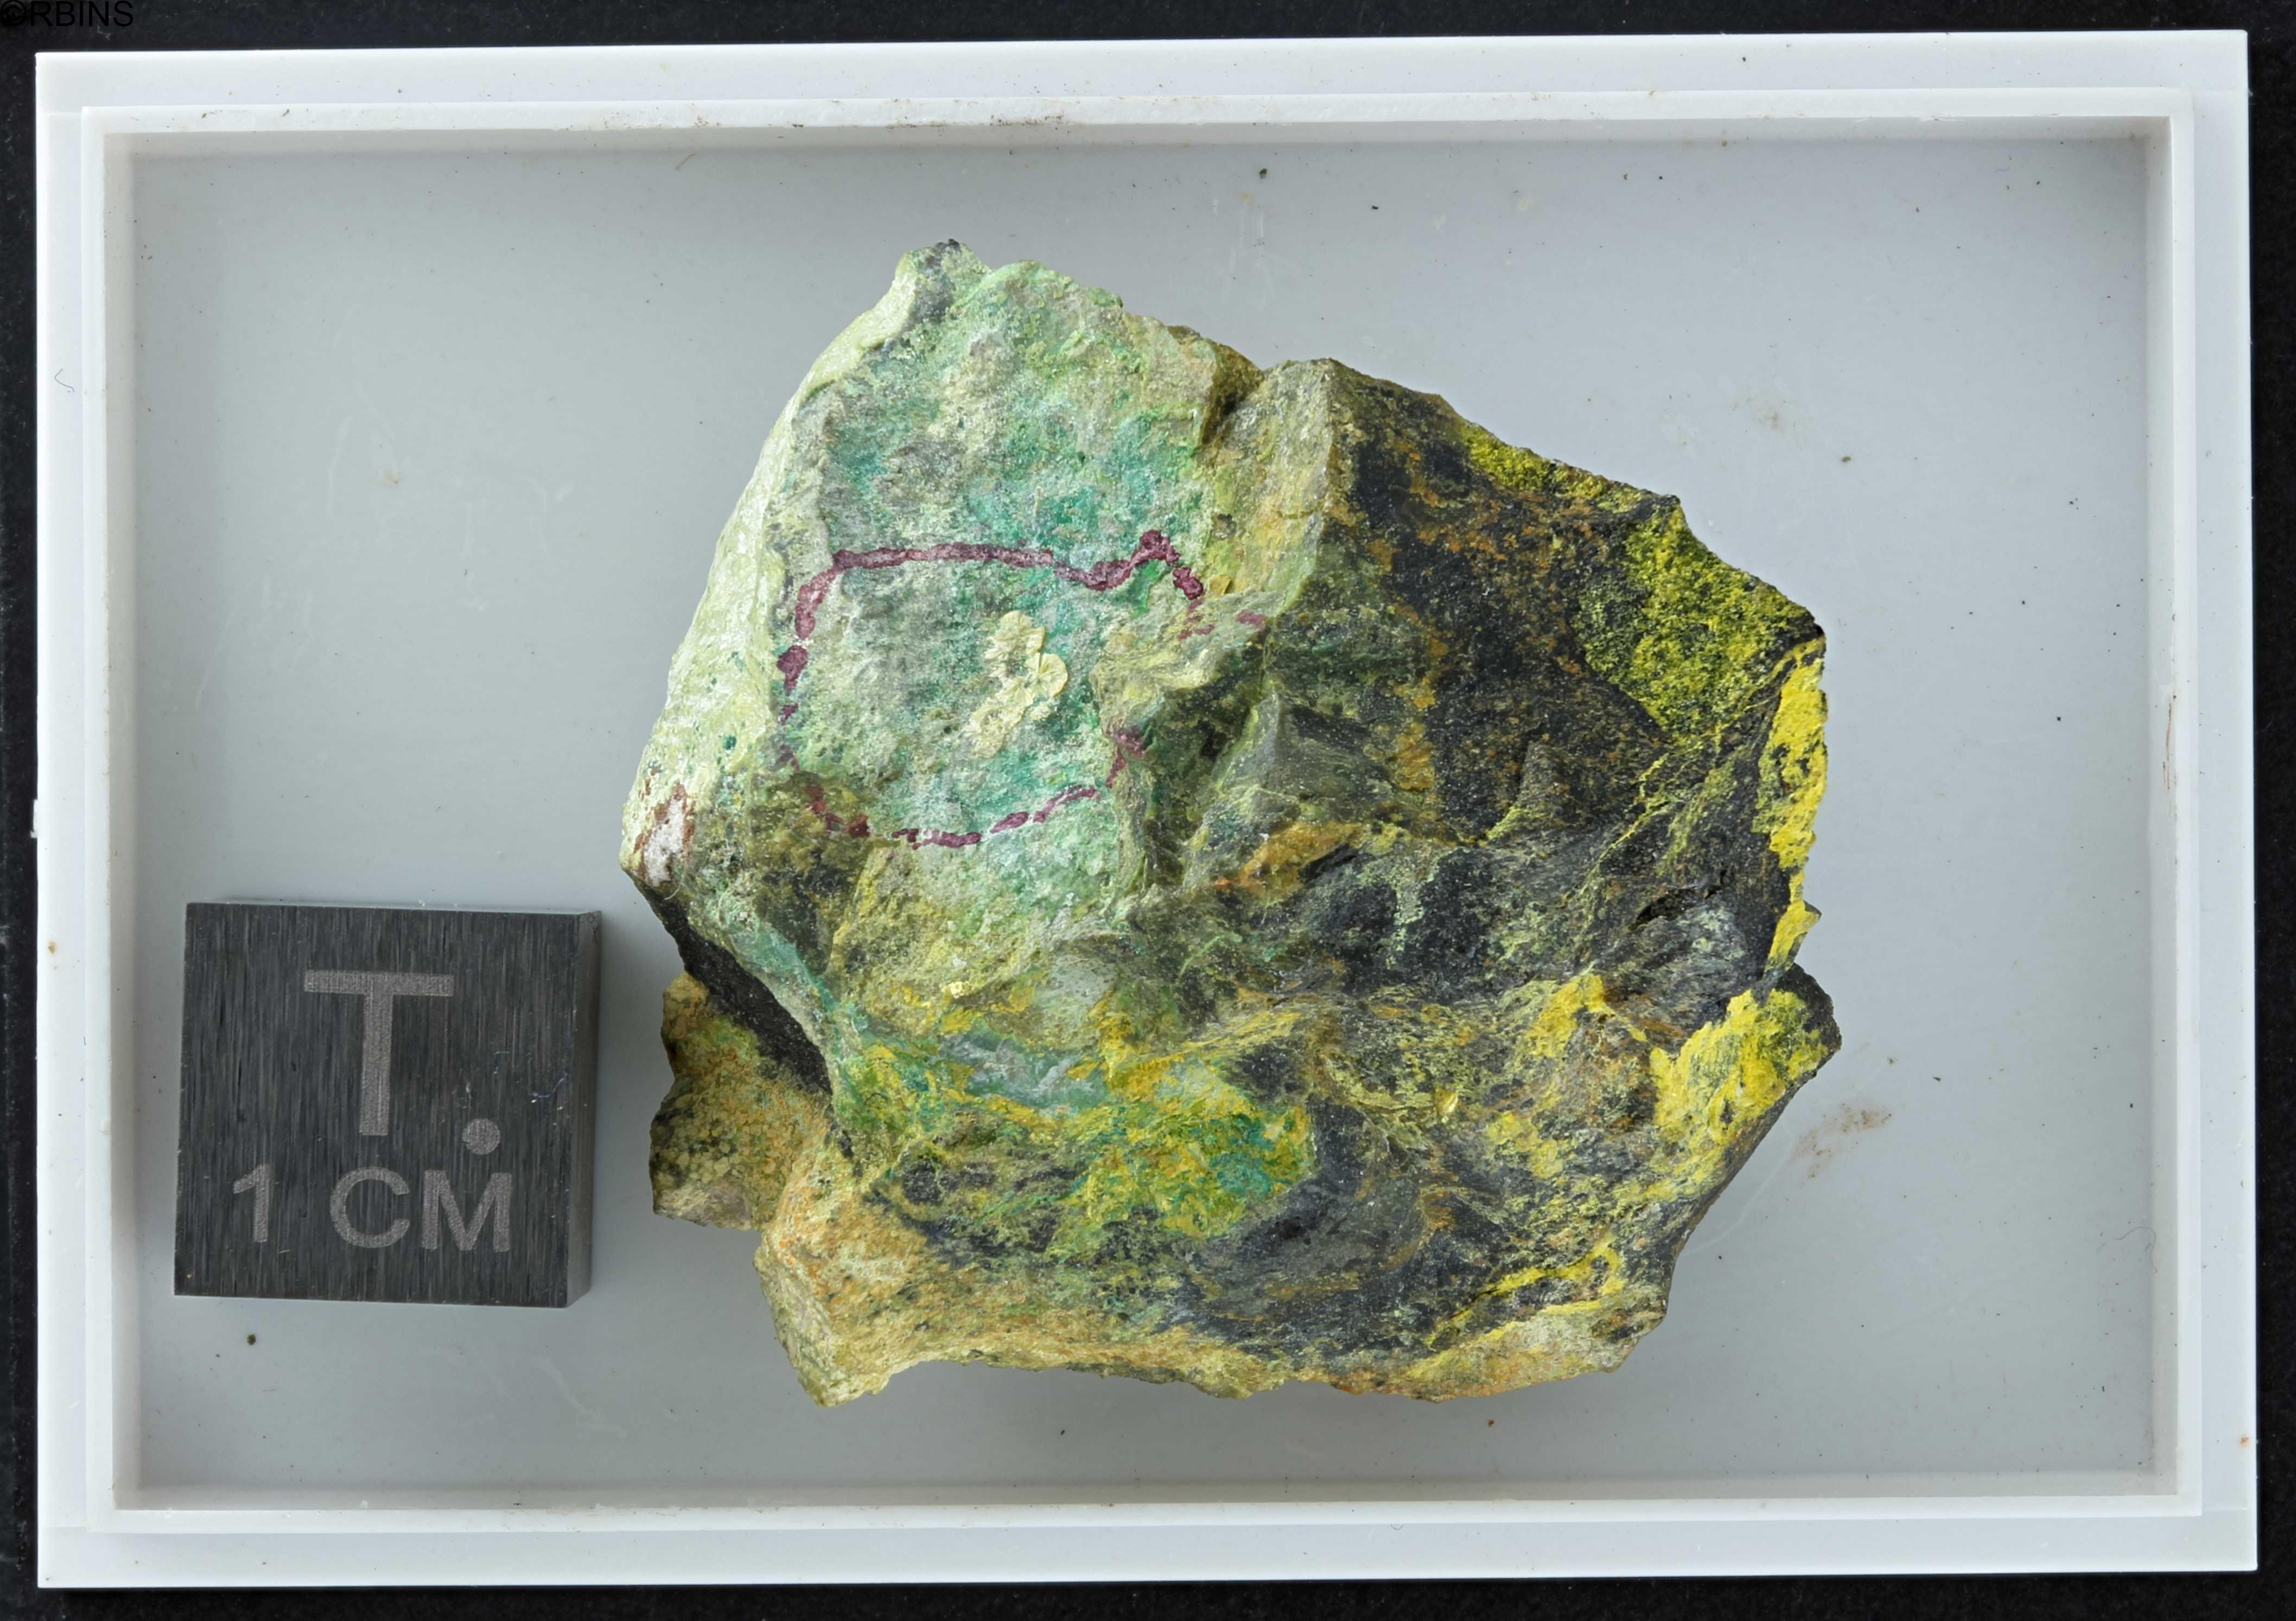 rc3511-holotype-zs-pmax_dxo_lowq.jpg